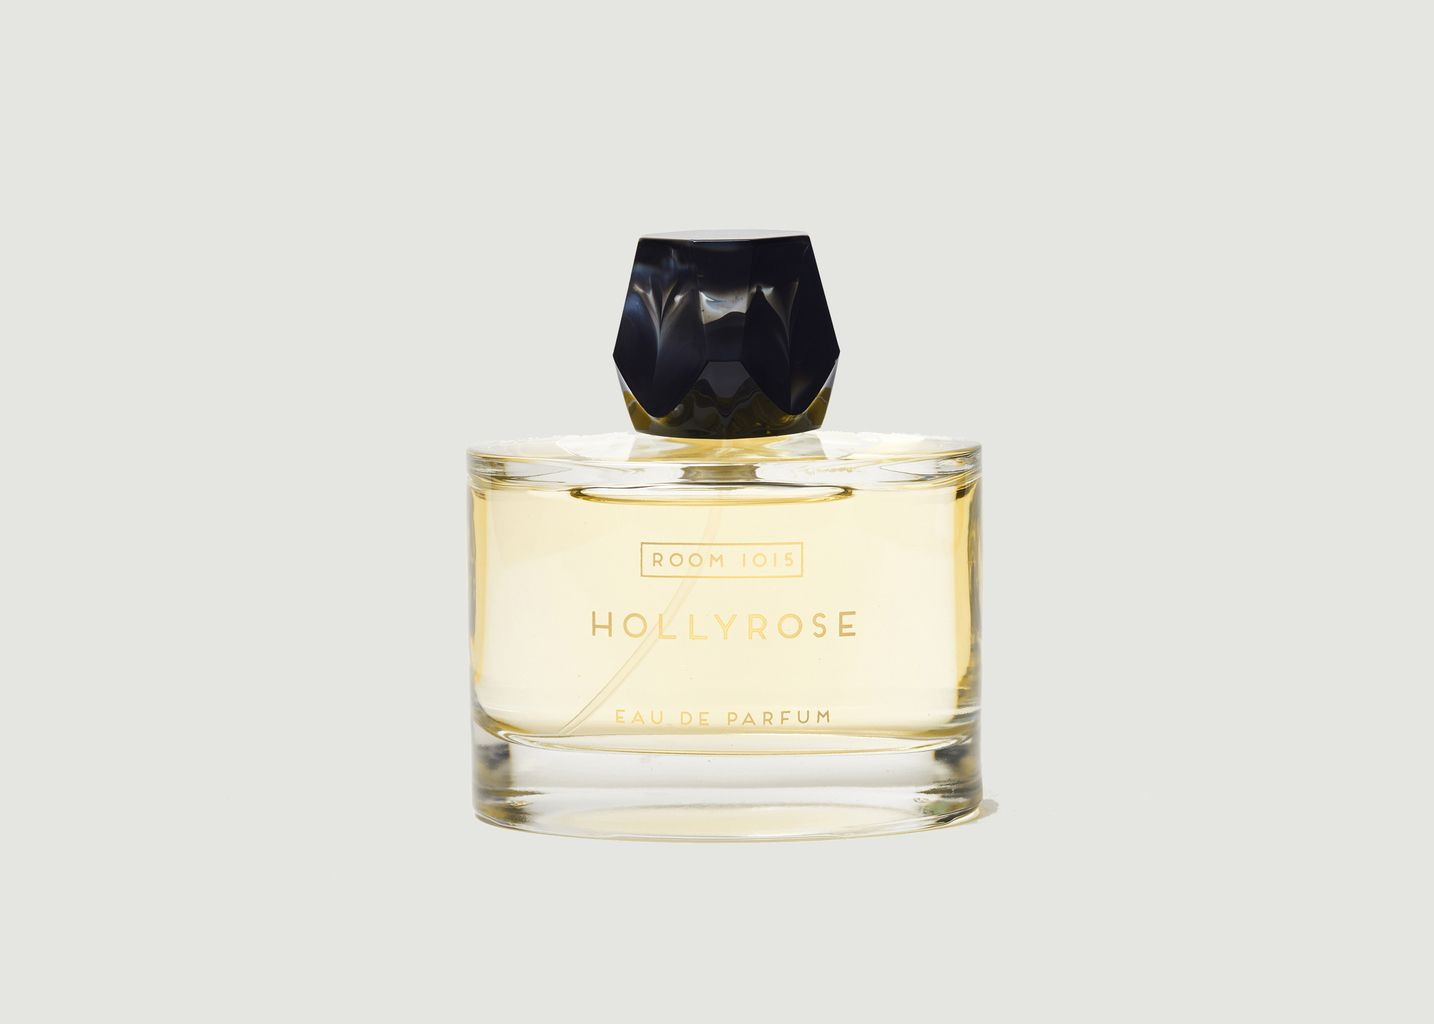 Parfum Hollyrose 100ml - Room 1015